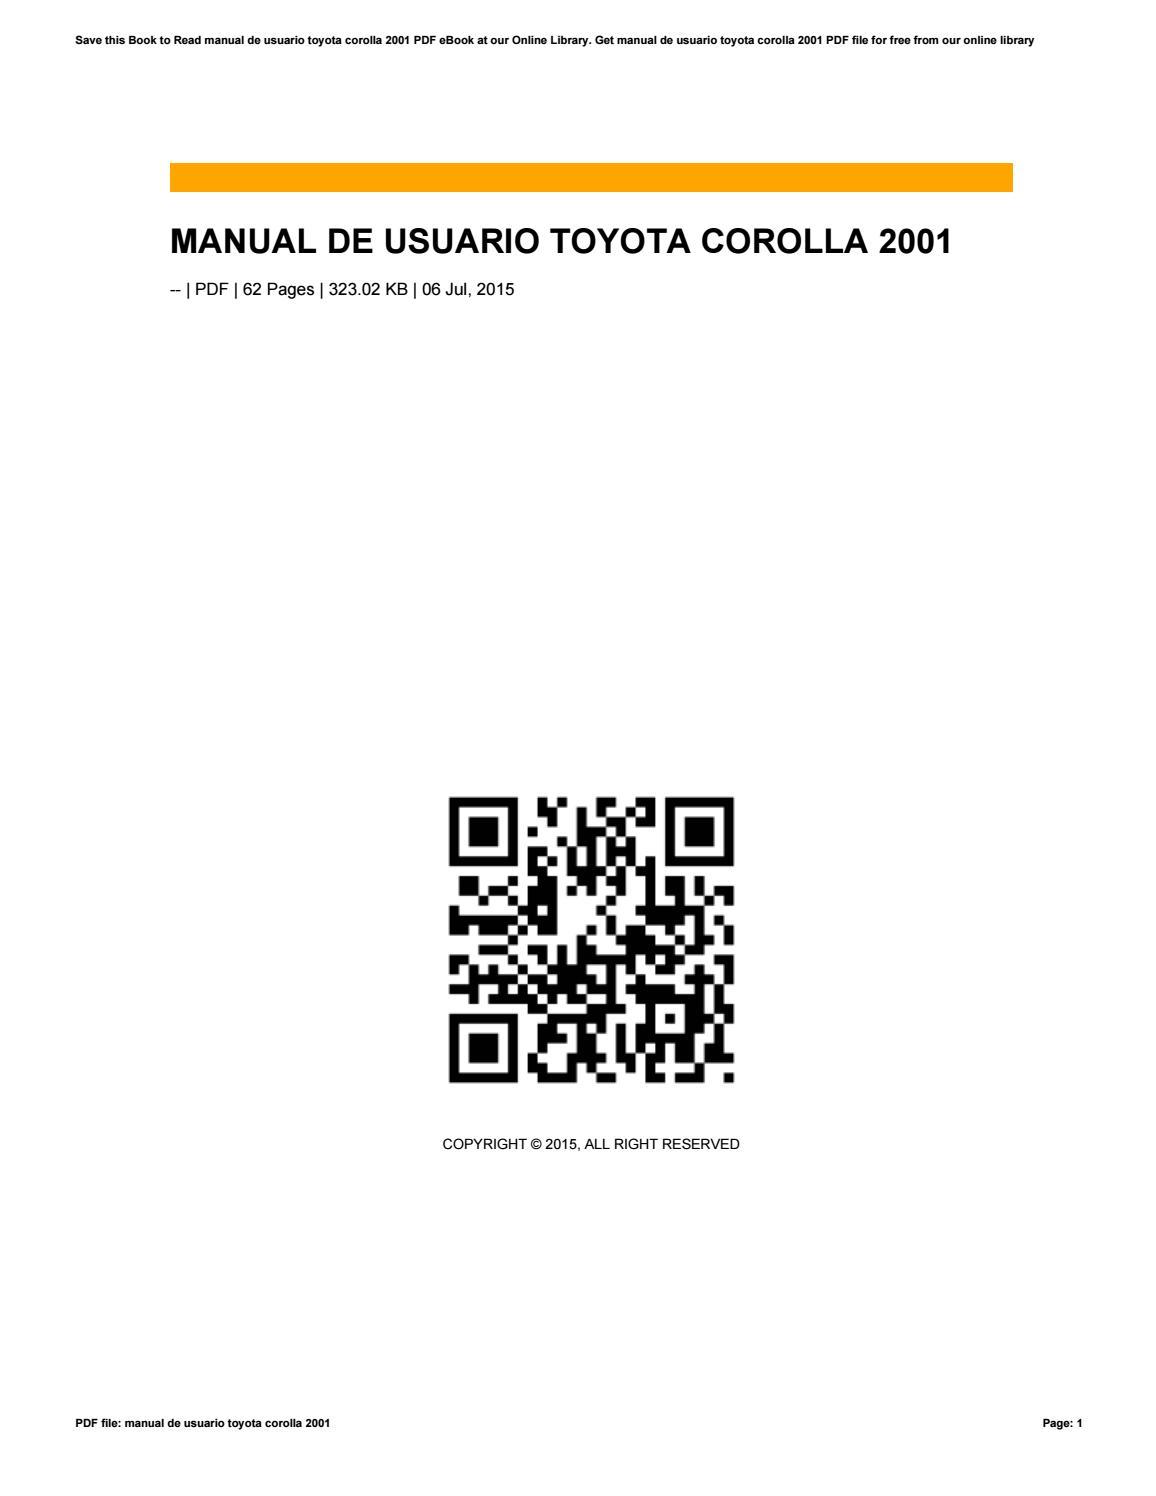 Manual de usuario toyota corolla 2001 by kasfeia89jsdua